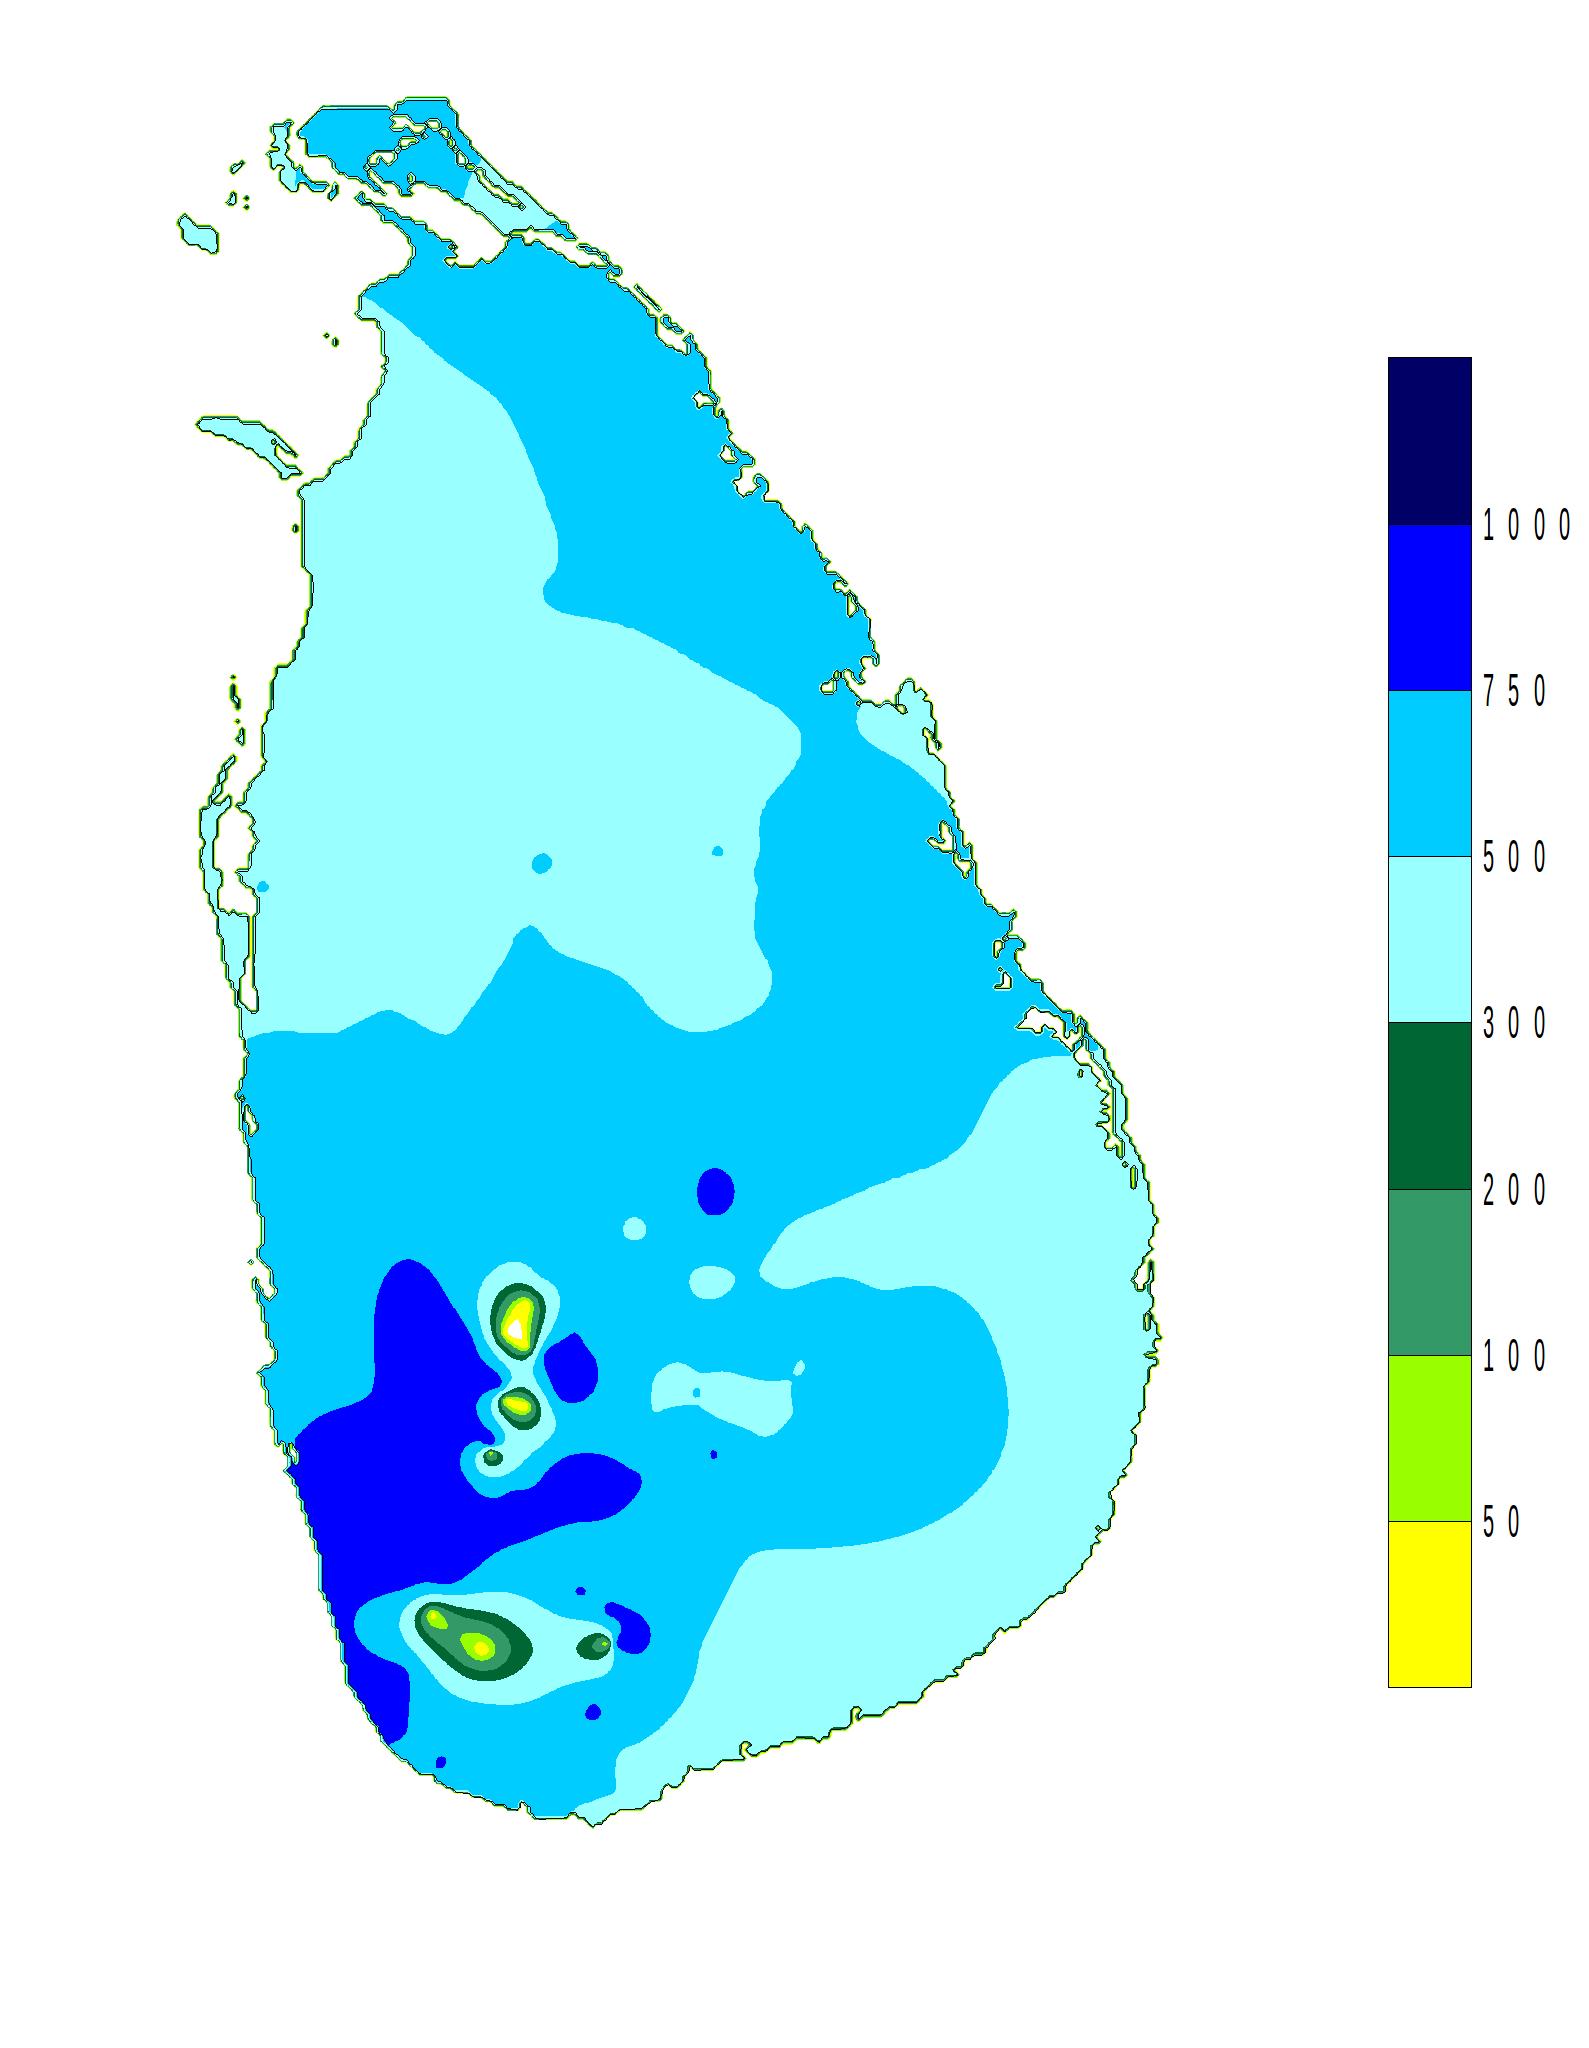 2nd inter-monsoon (Oct-Nov)